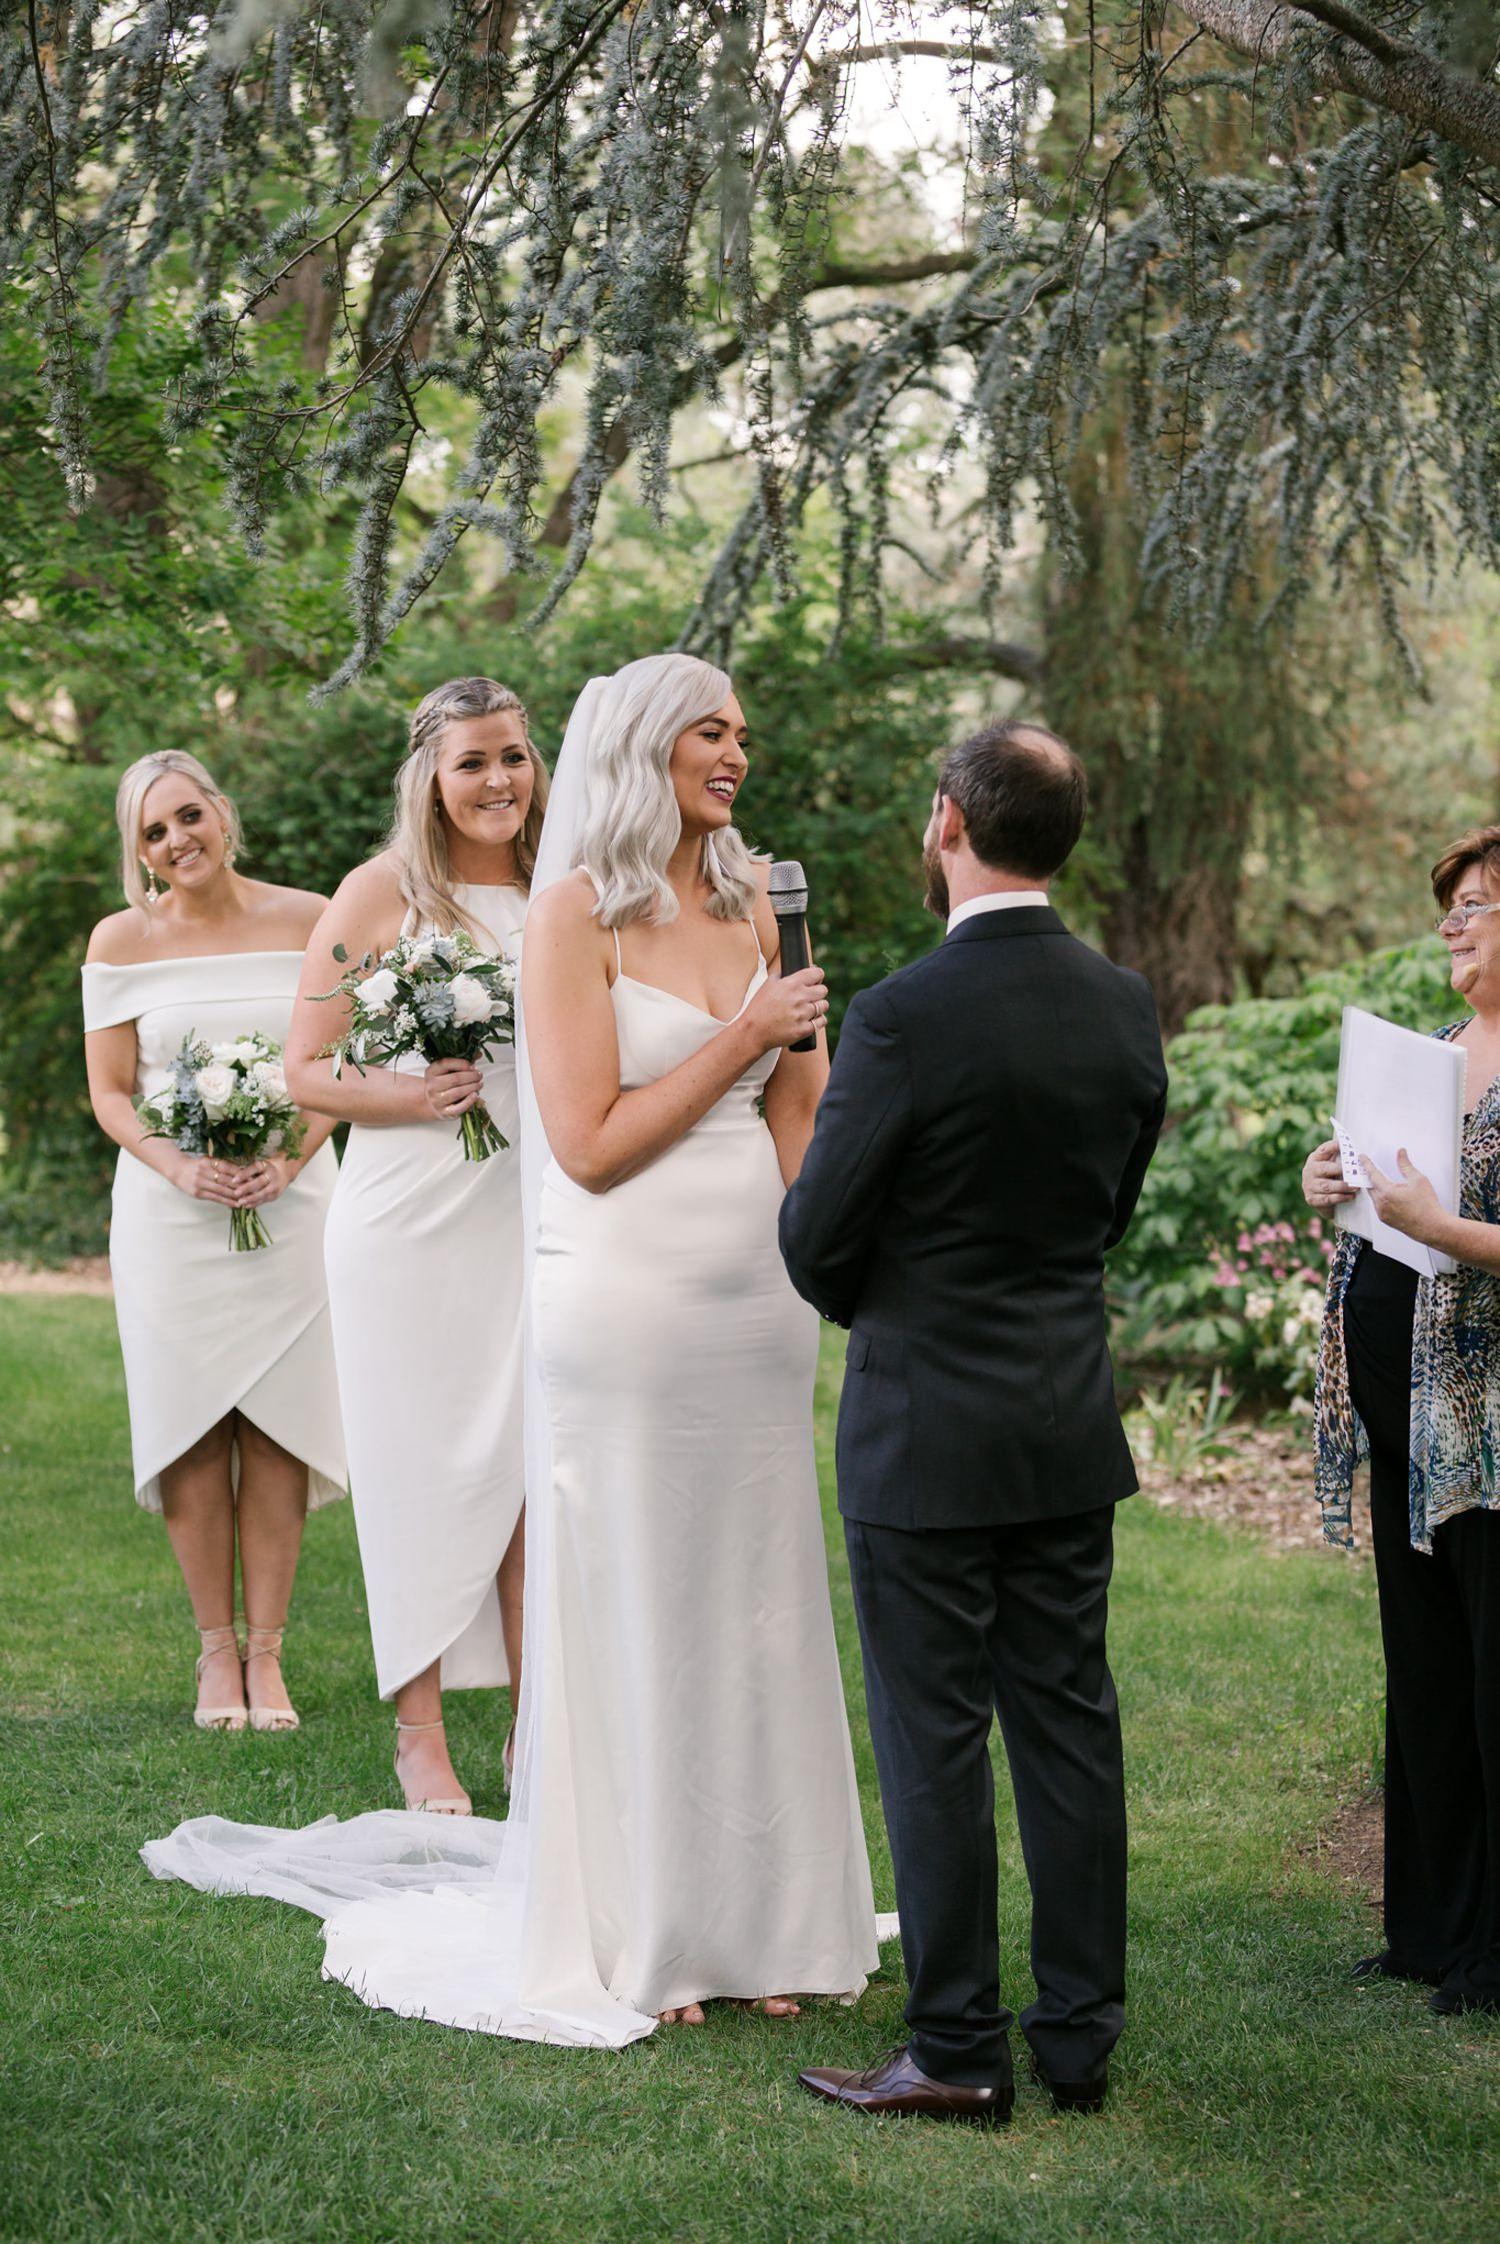 brea luke erin latimore photography athol gardens wedding blayney 15.jpg